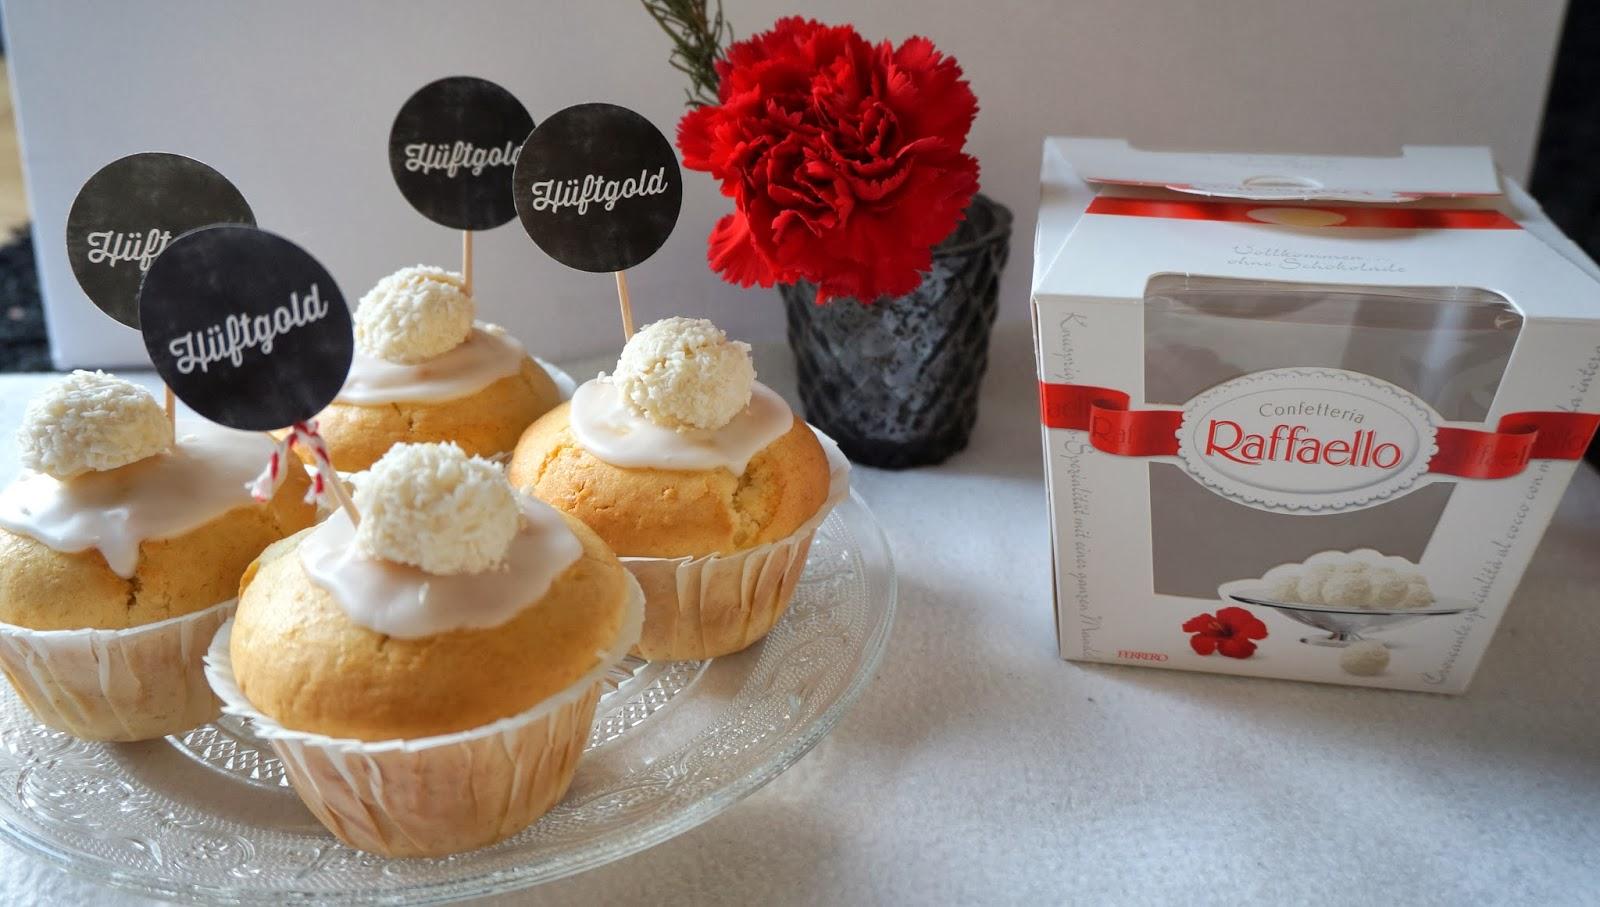 Cupcakes mit Kokos Raffaello Hüftgold Cupcakes weiß